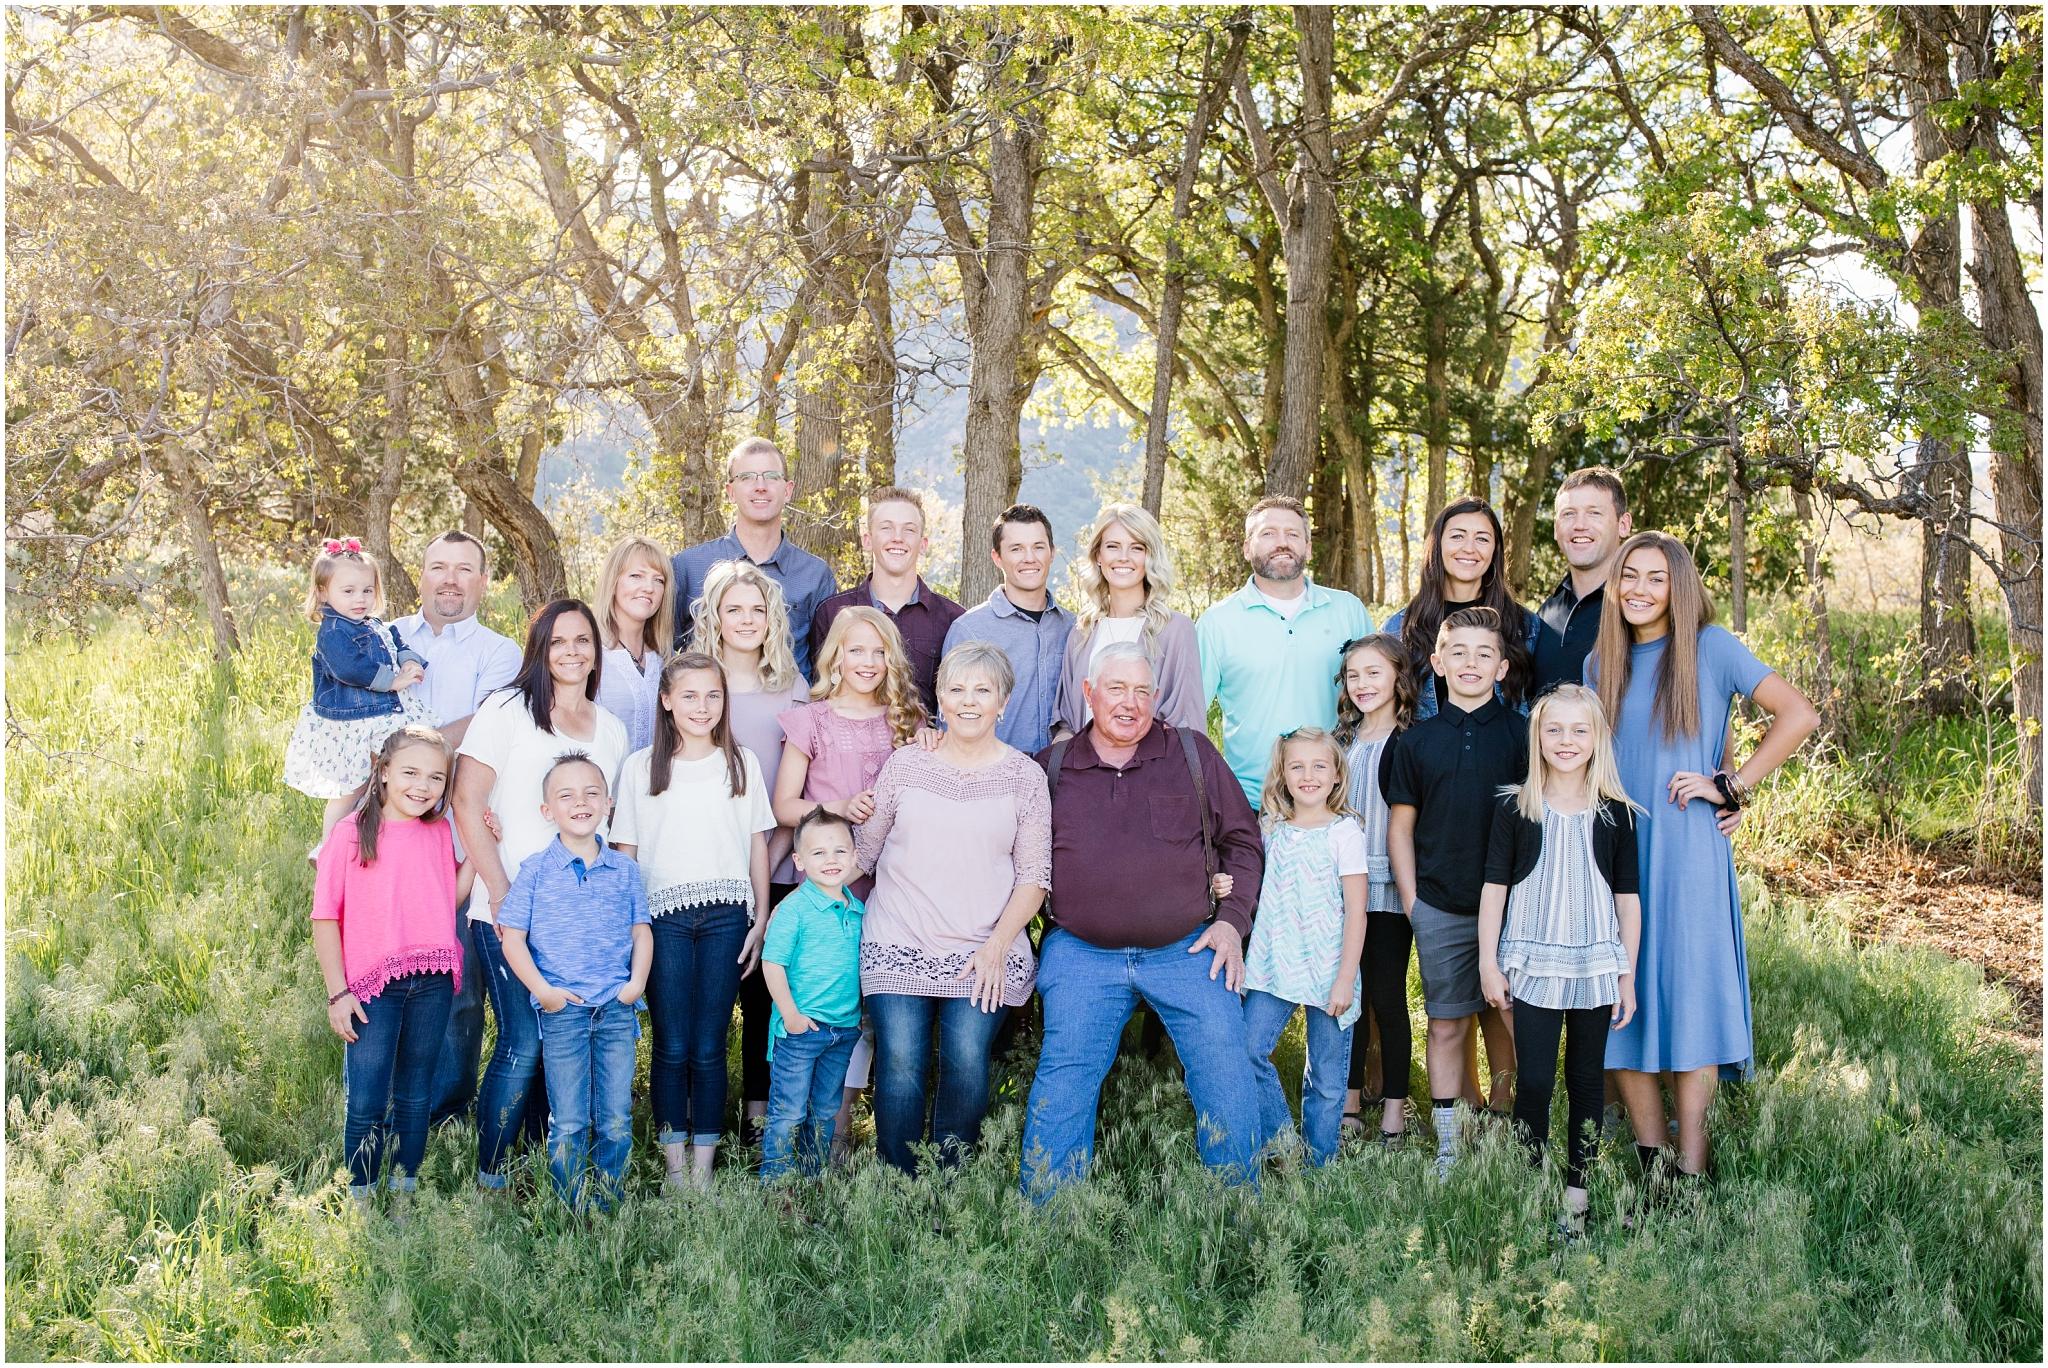 Bagley-1_Lizzie-B-Imagery-Utah-Family-Photographer-Central-Utah-Photographer-Utah-County-Extended-Family-1.jpg